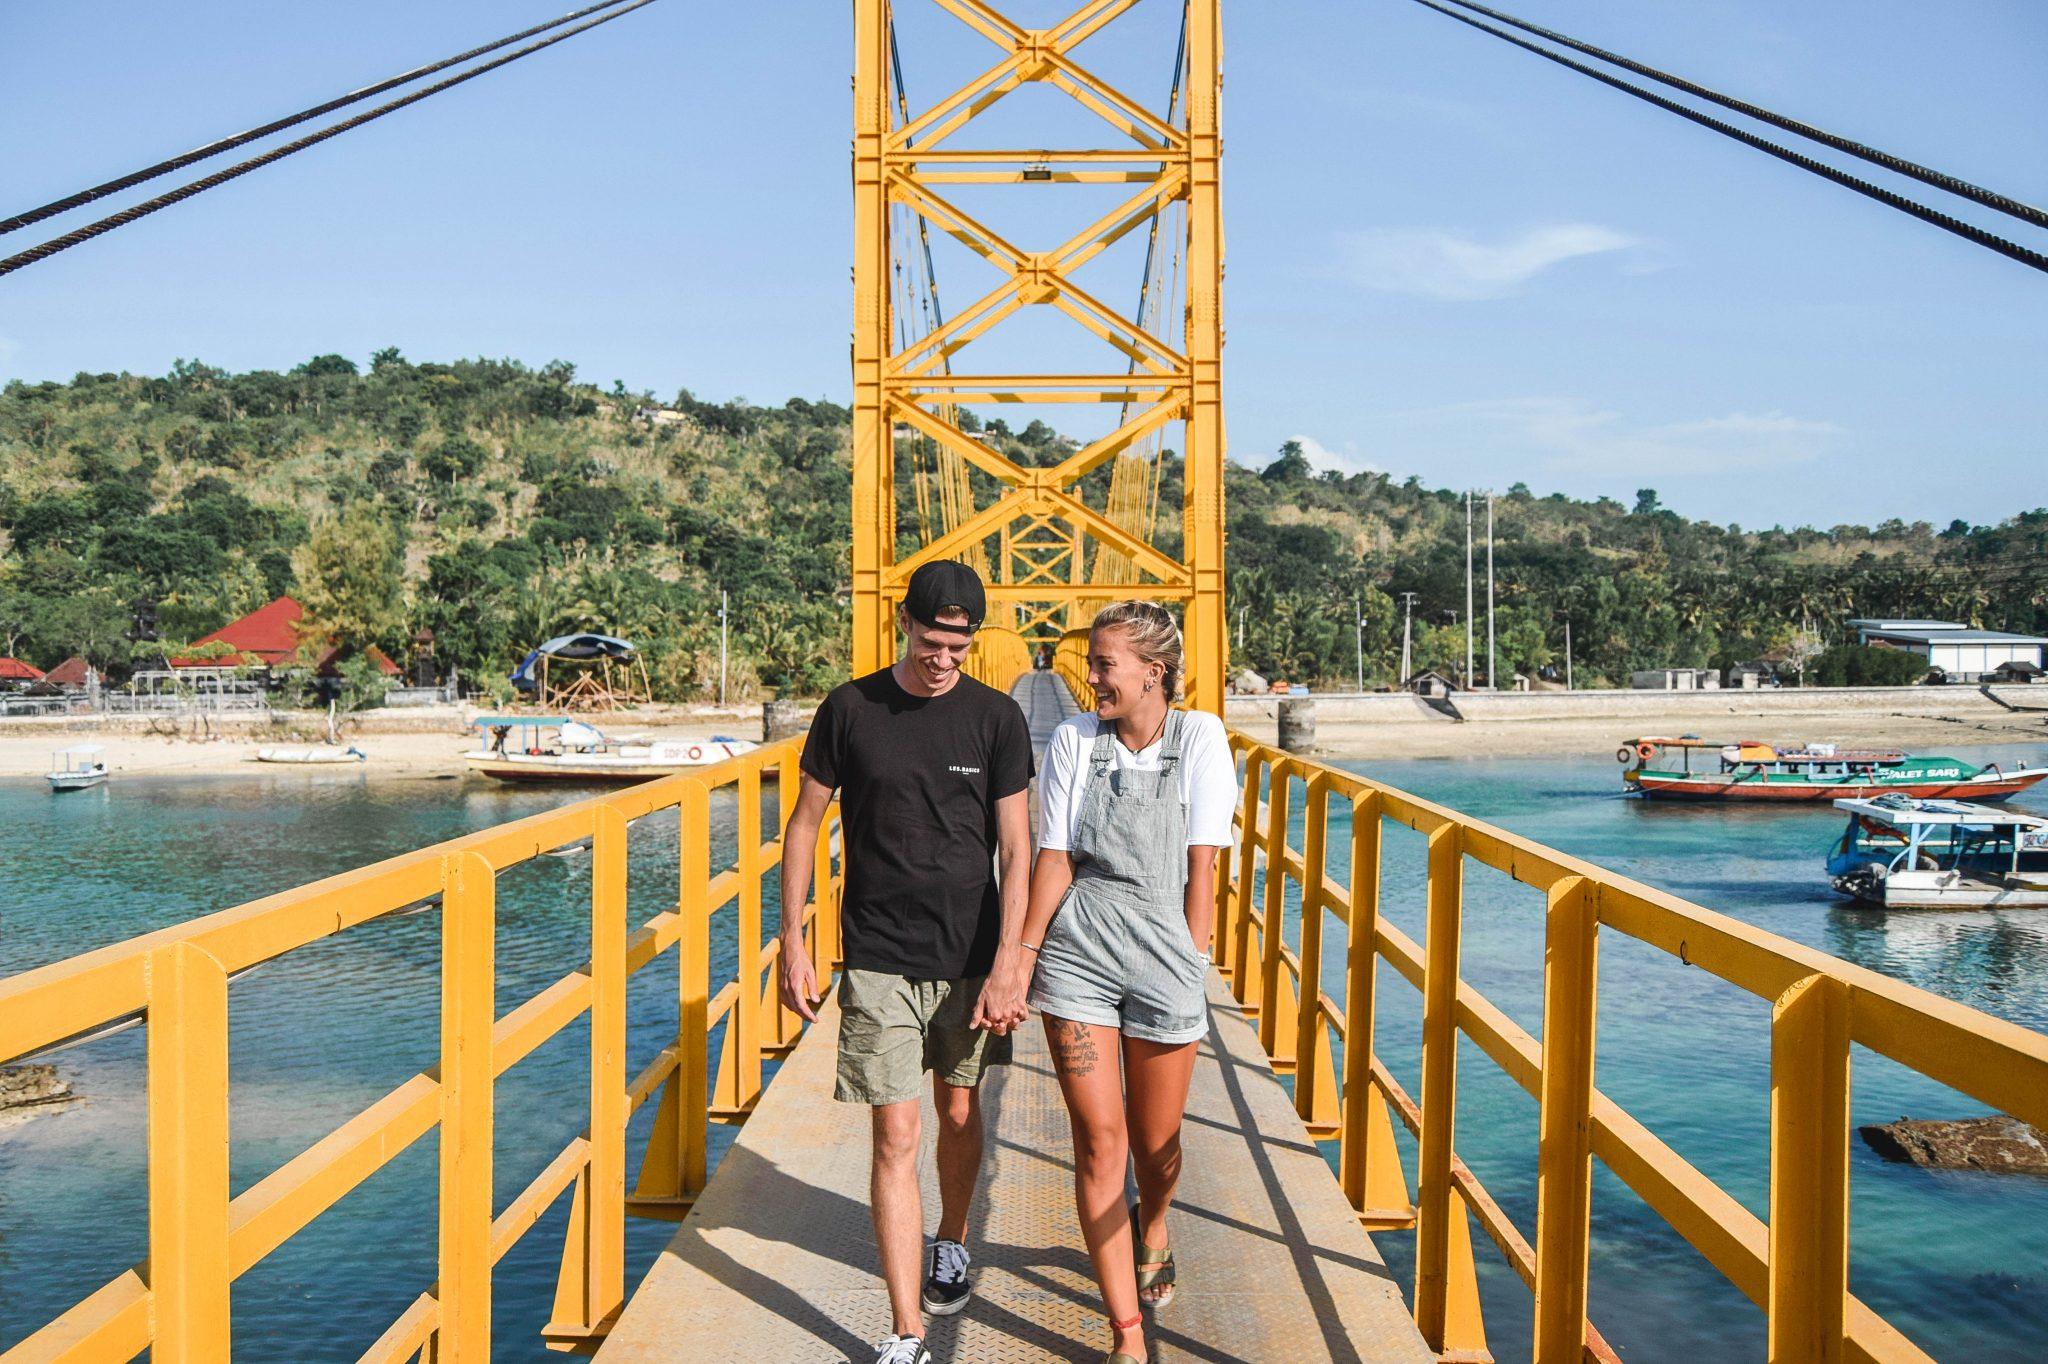 Wanderers & Warriors - Charlie & Lauren UK Travel Couple - The Yellow Bridge - Nusa Lembongan To Cenengan - Yellow Bridge Lembongan Bali - Things To Do On Nusa Lembongan